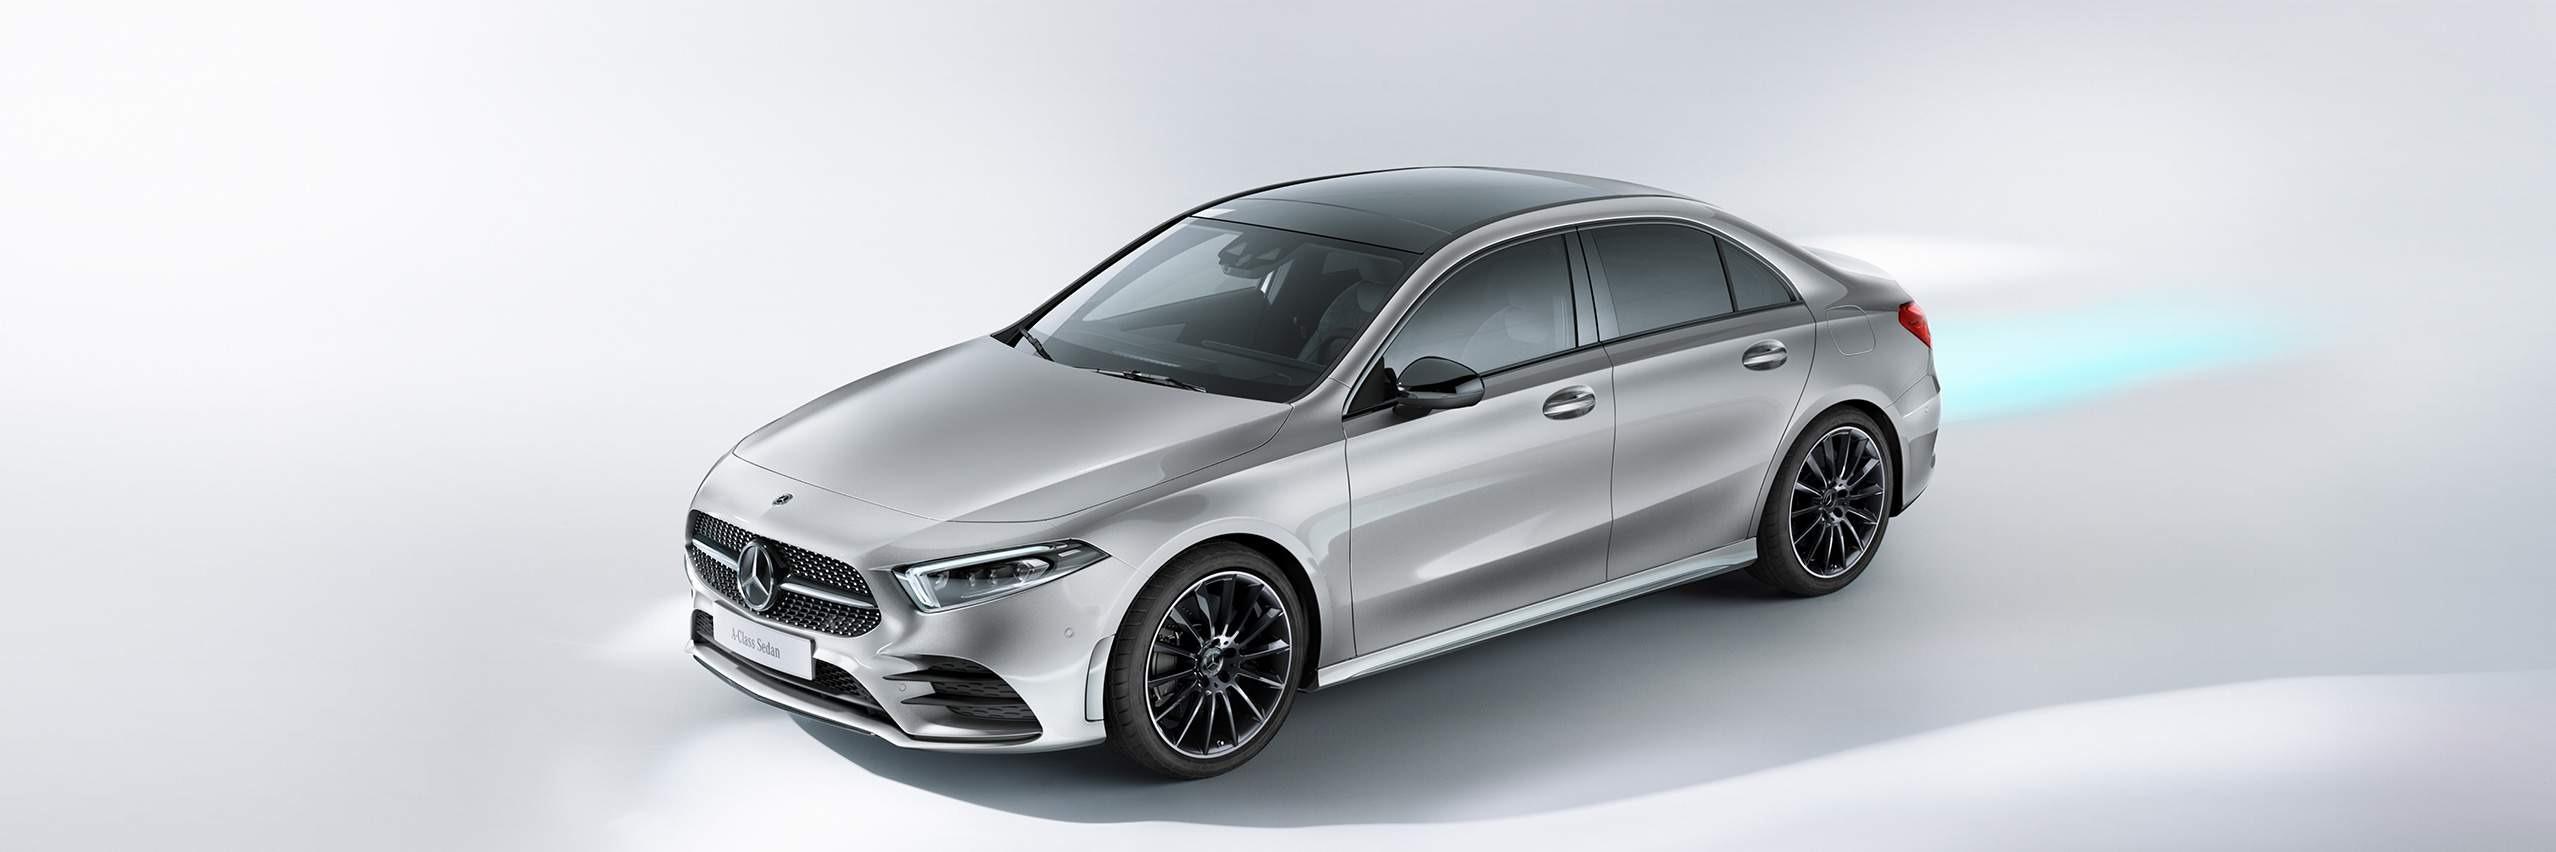 ТехнологииMercedes-Benz A-Class